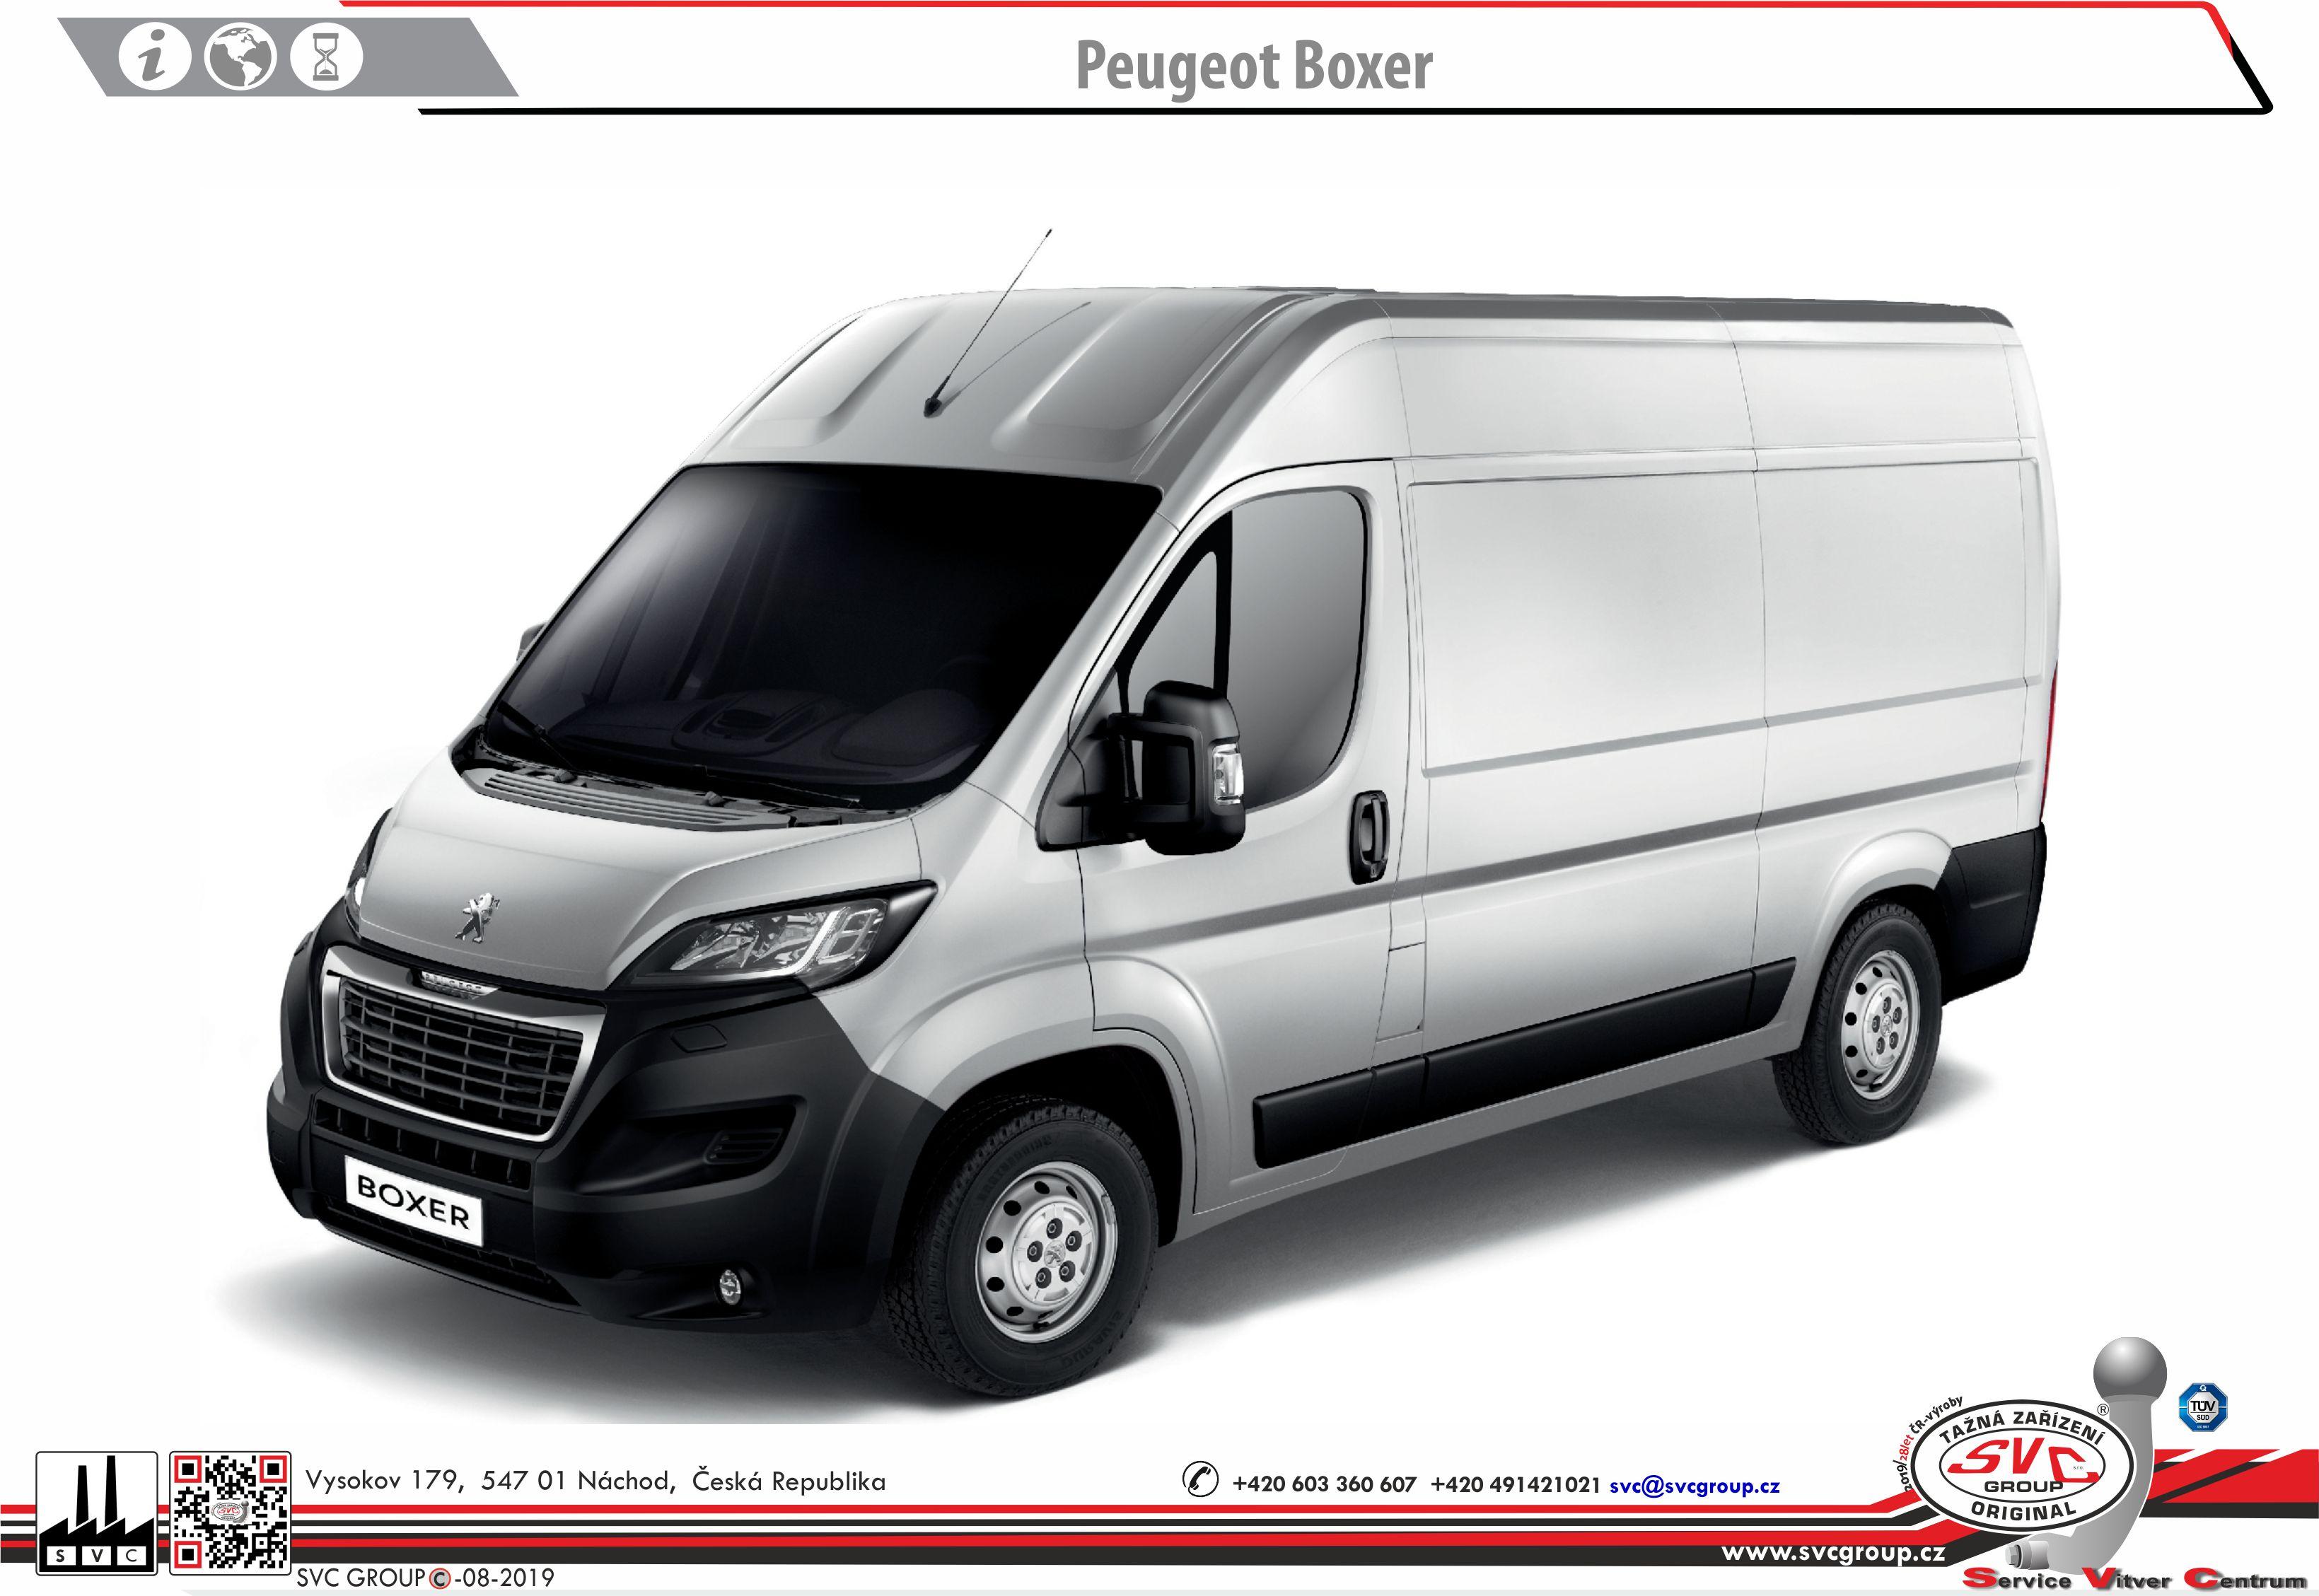 Peugeot Boxer Dodávka / Bus